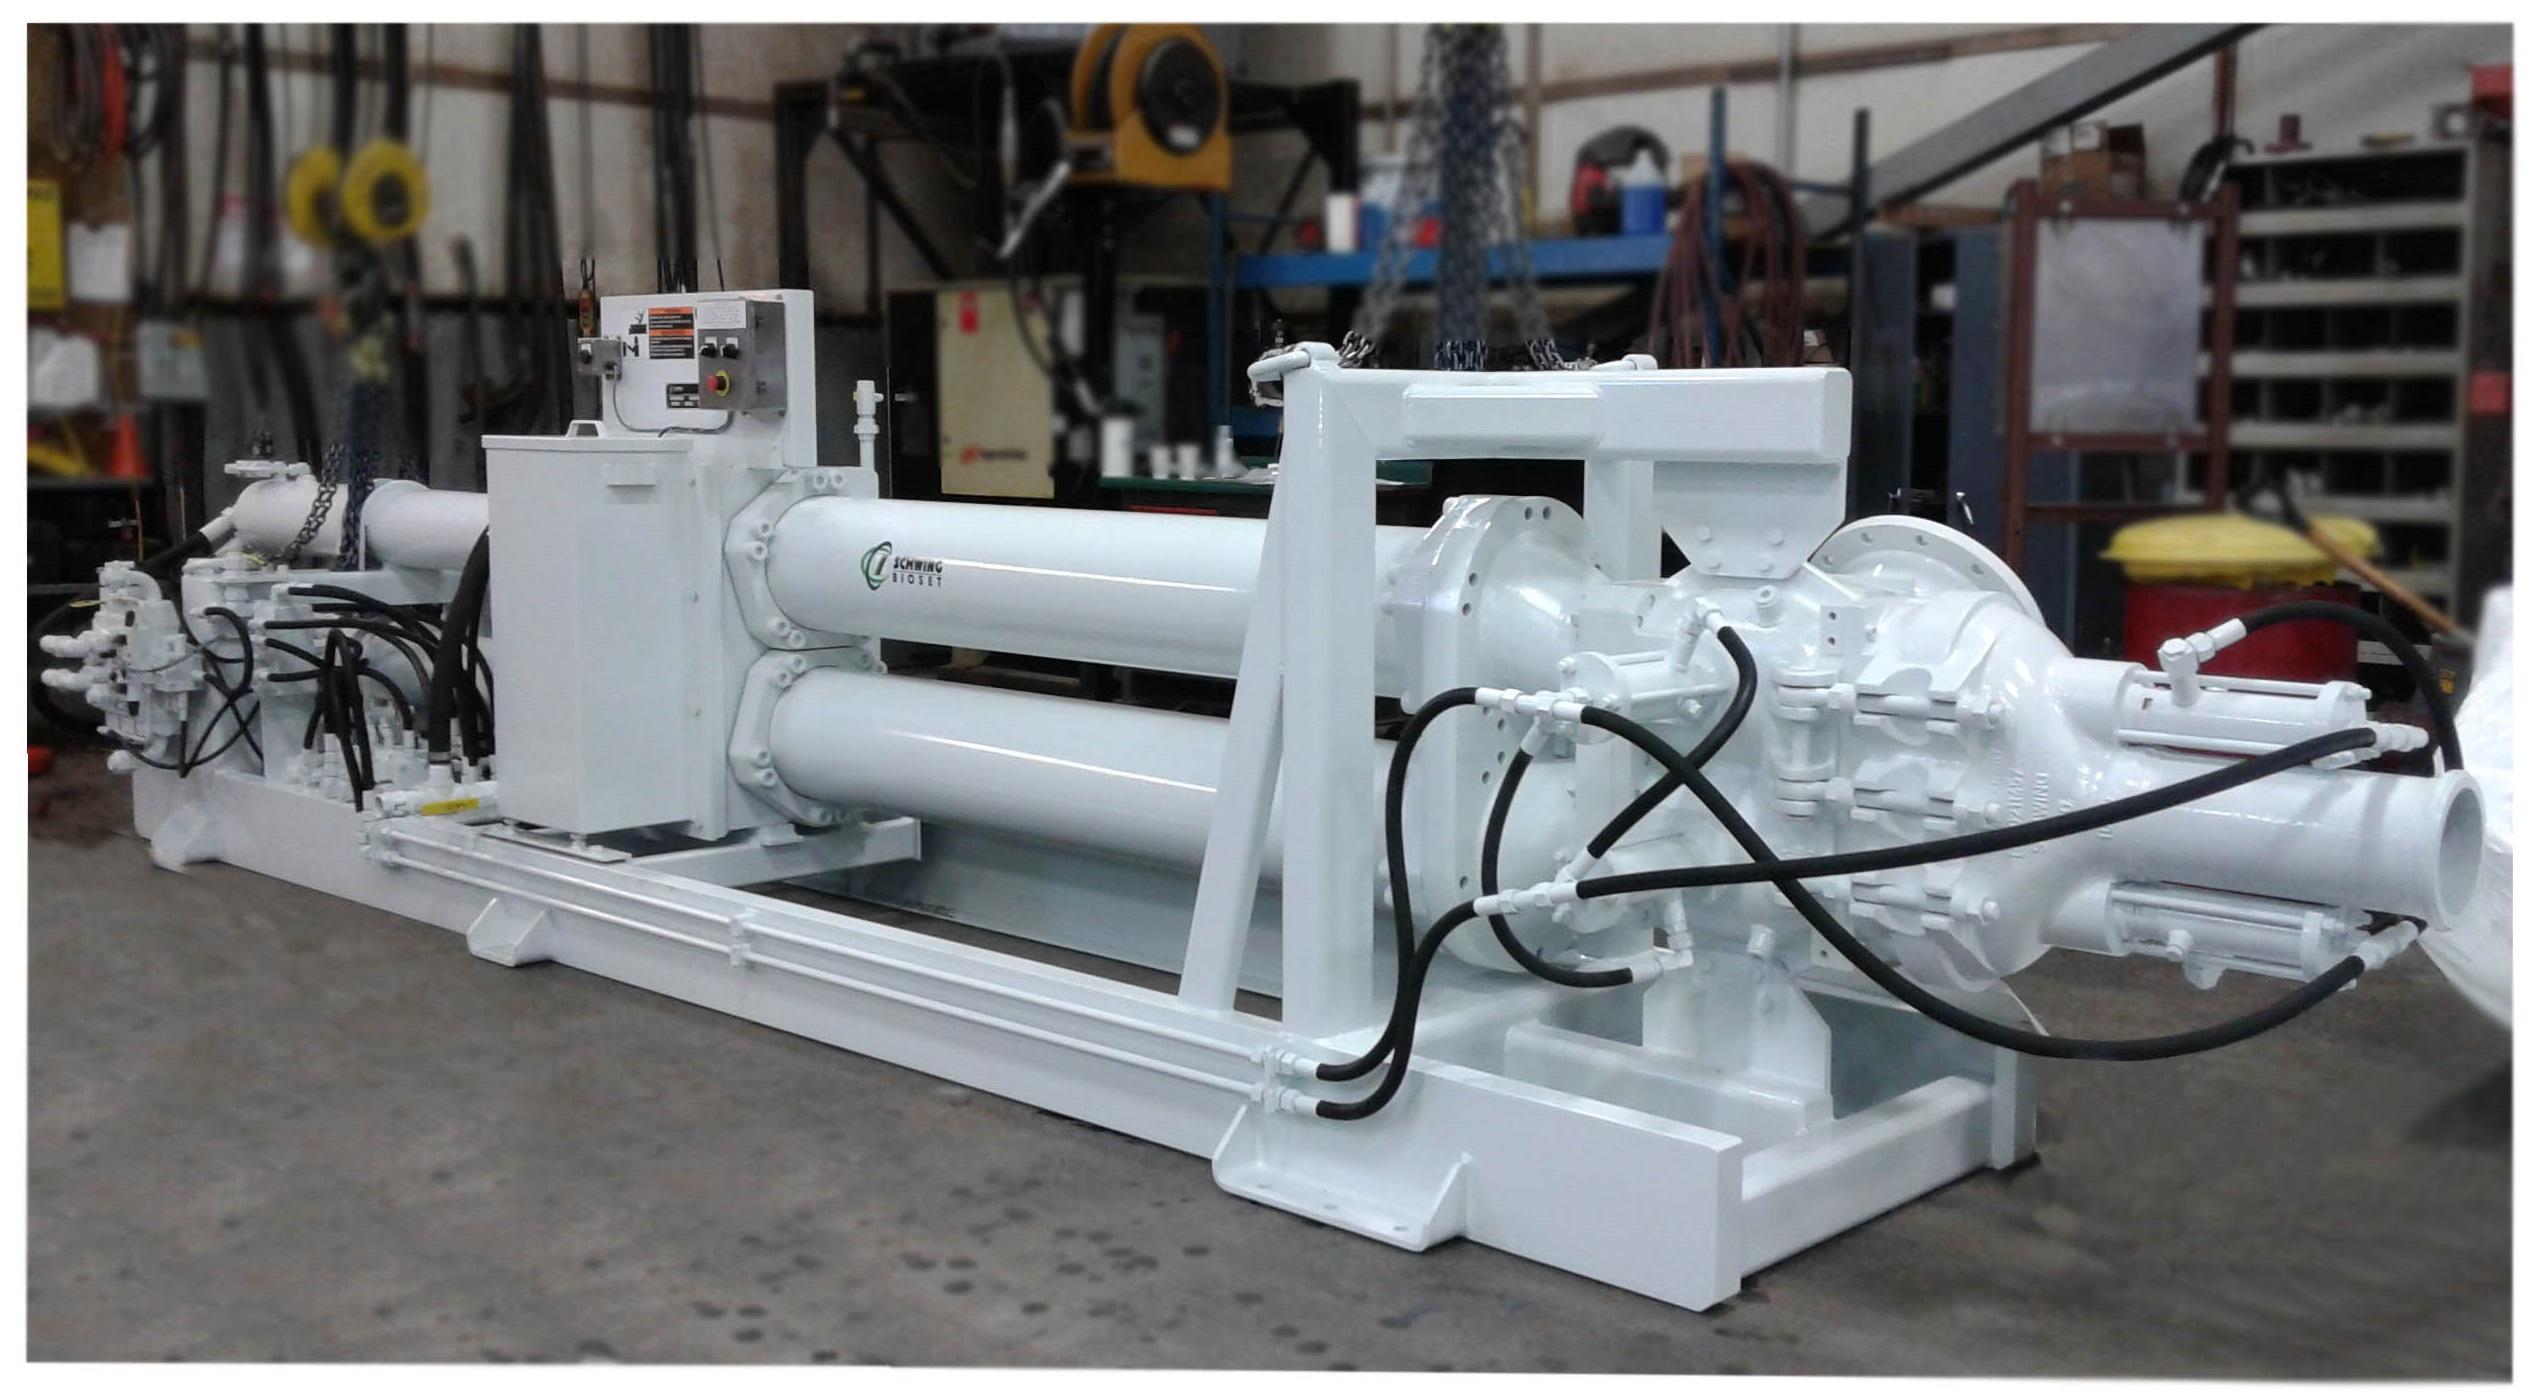 Schwing Bioset Piston Pump for Myra Falls Mine